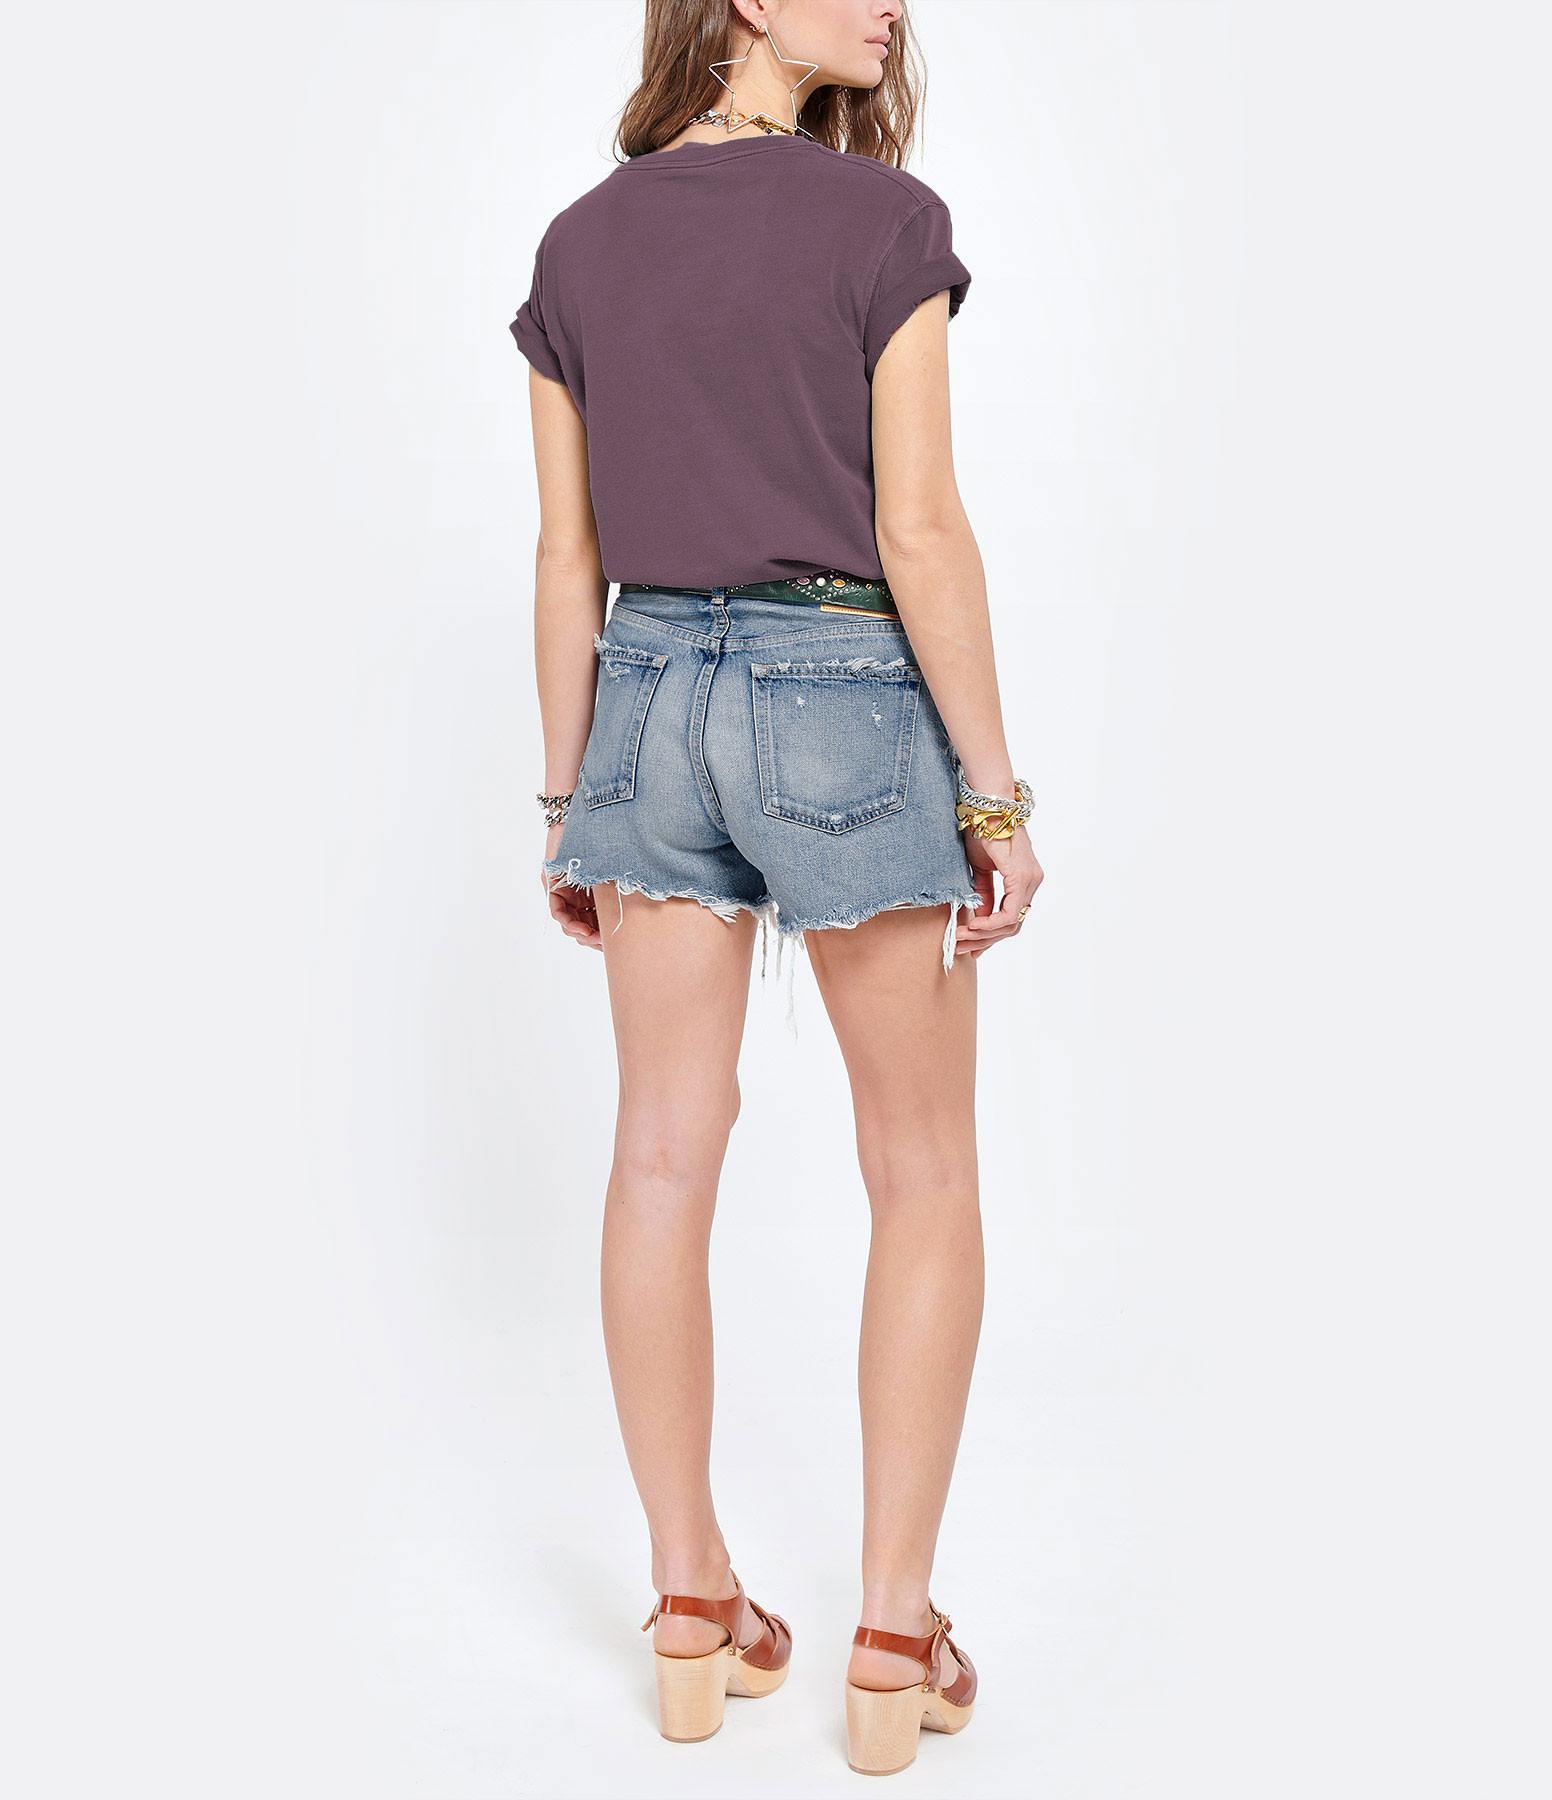 NEWTONE - Tee-shirt Trucker Joy Coton Cerise